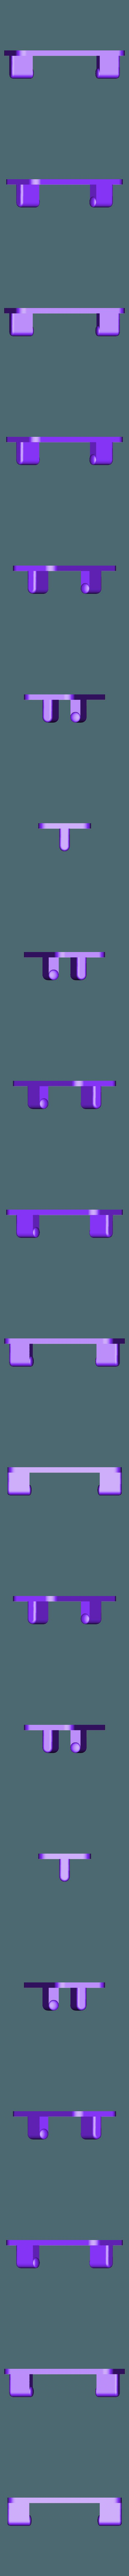 Piede.stl Download free STL file Adjustable Laptop Stand [WIP] • 3D printable template, Kliffom